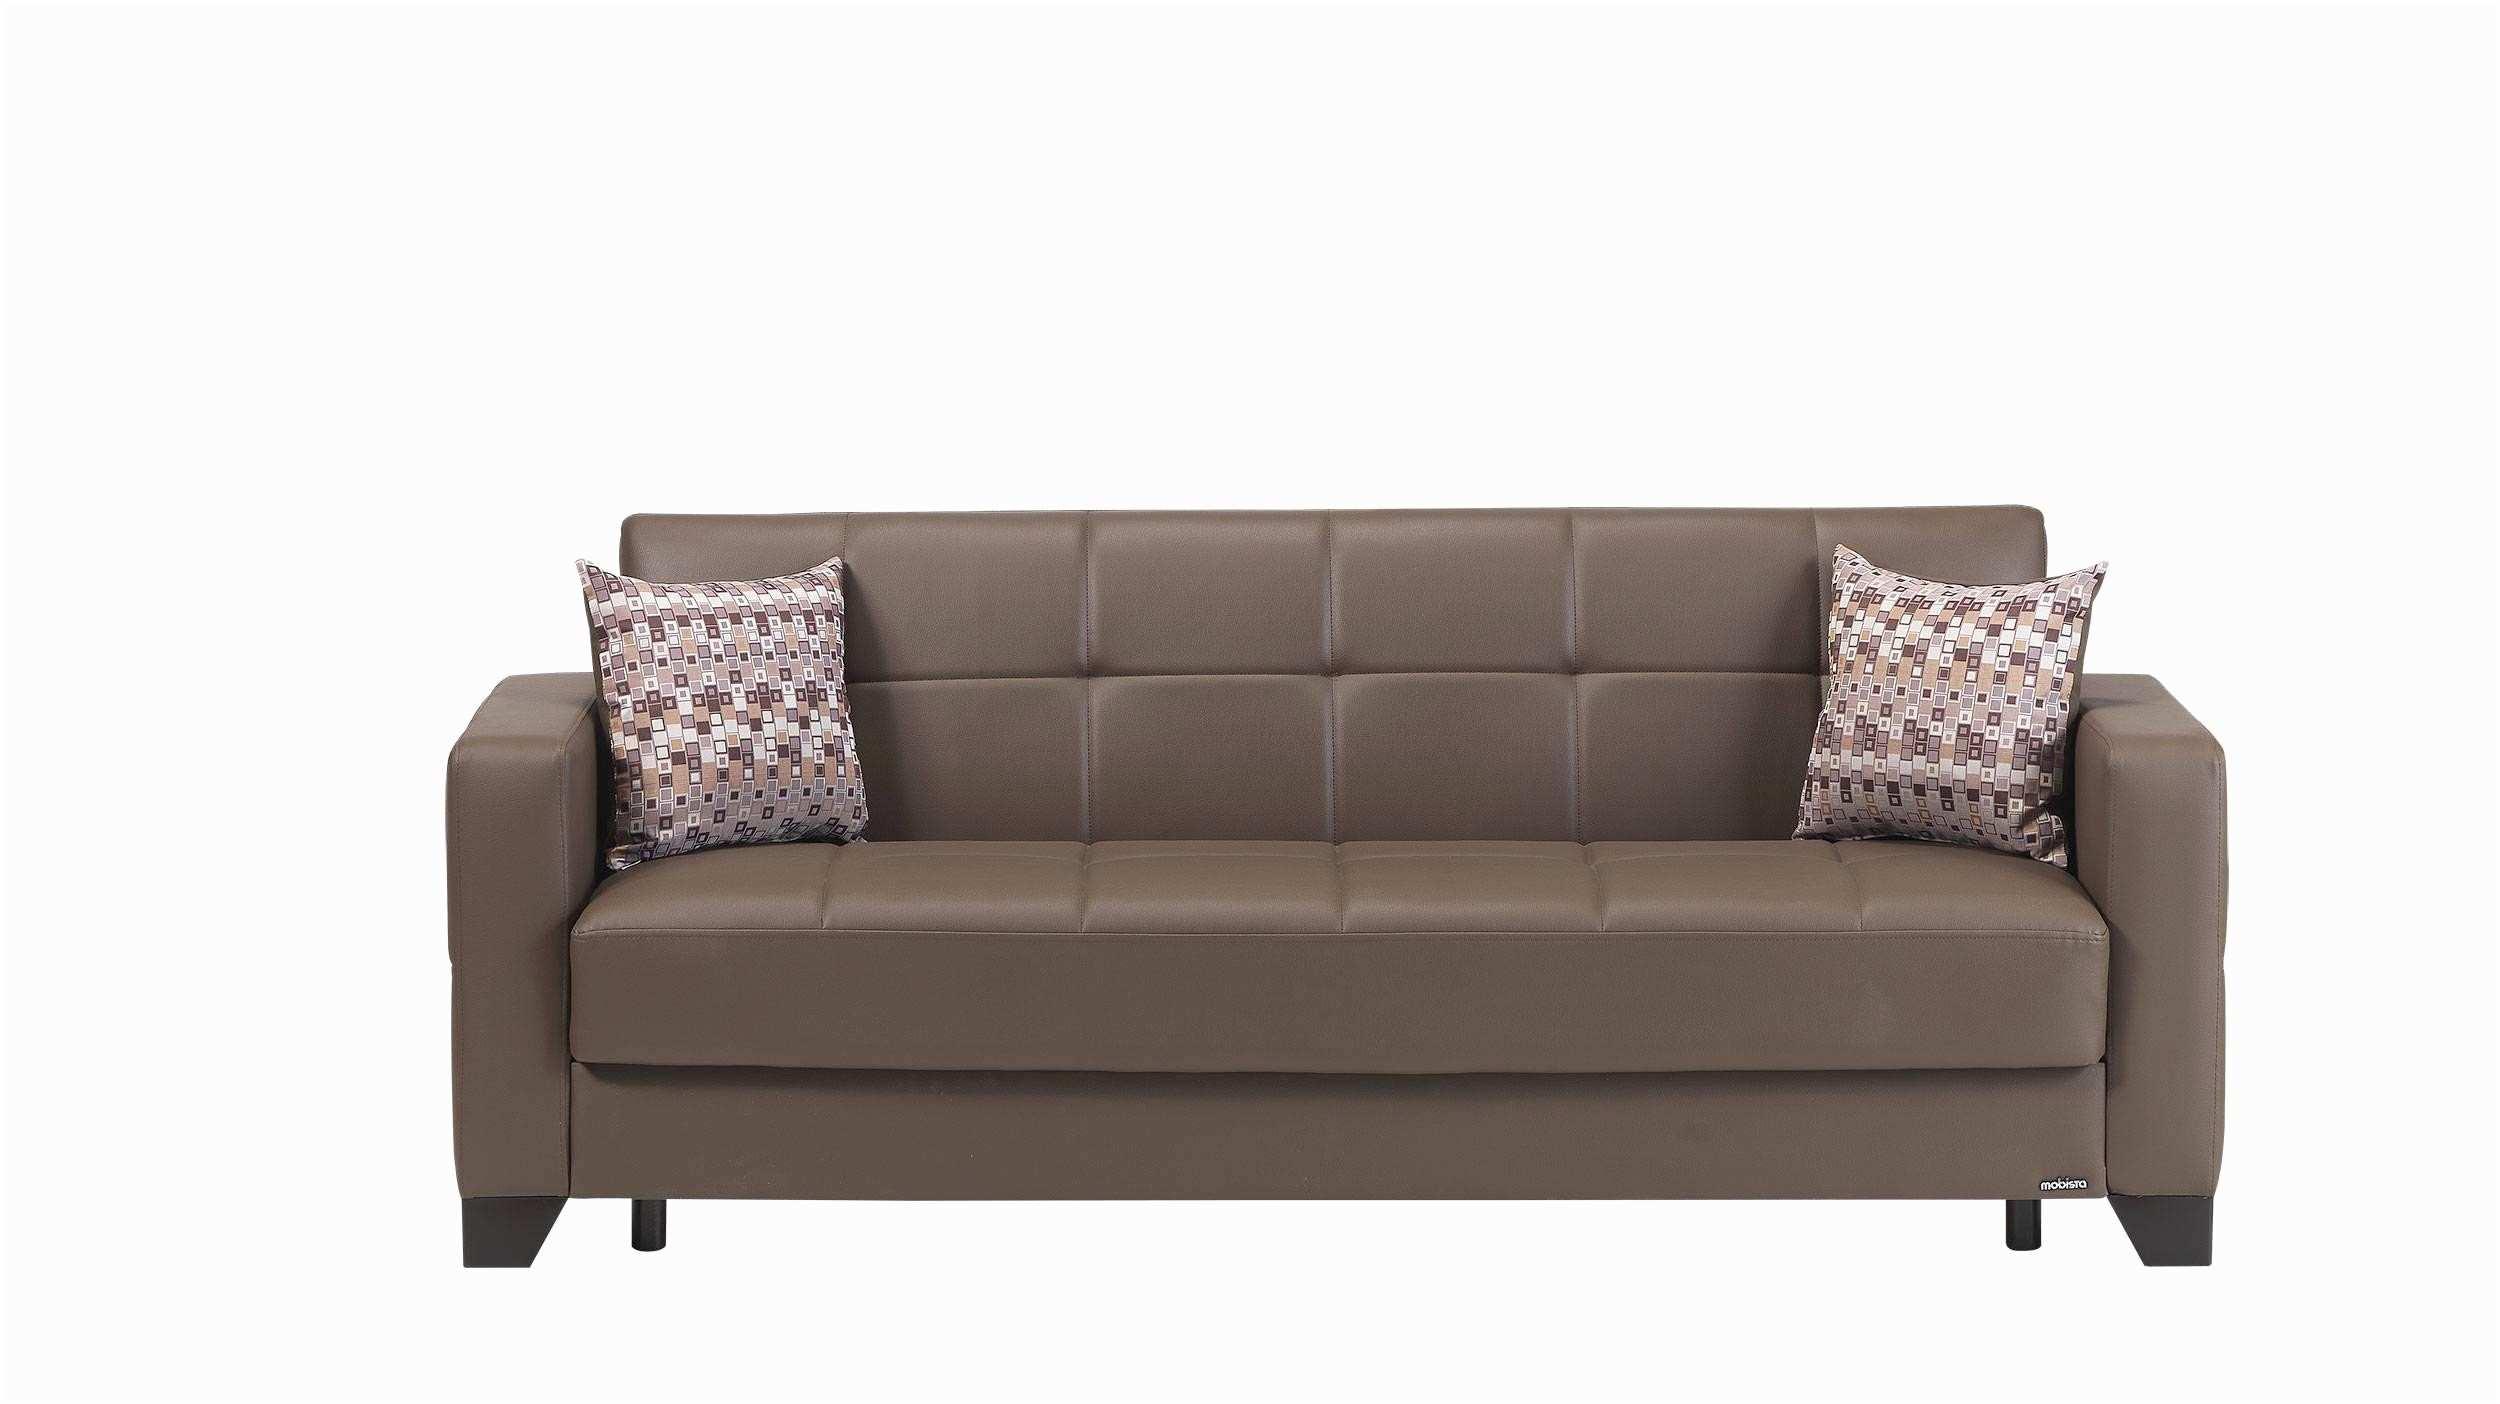 Full Size of Big Sofa Poco Mit Federkern Schn Couch Neu Sitzsack Günstiges Machalke 3 Sitzer Leder Hannover Abnehmbarer Bezug Erpo Rattan Angebote Megapol Hersteller Sofa Big Sofa Poco